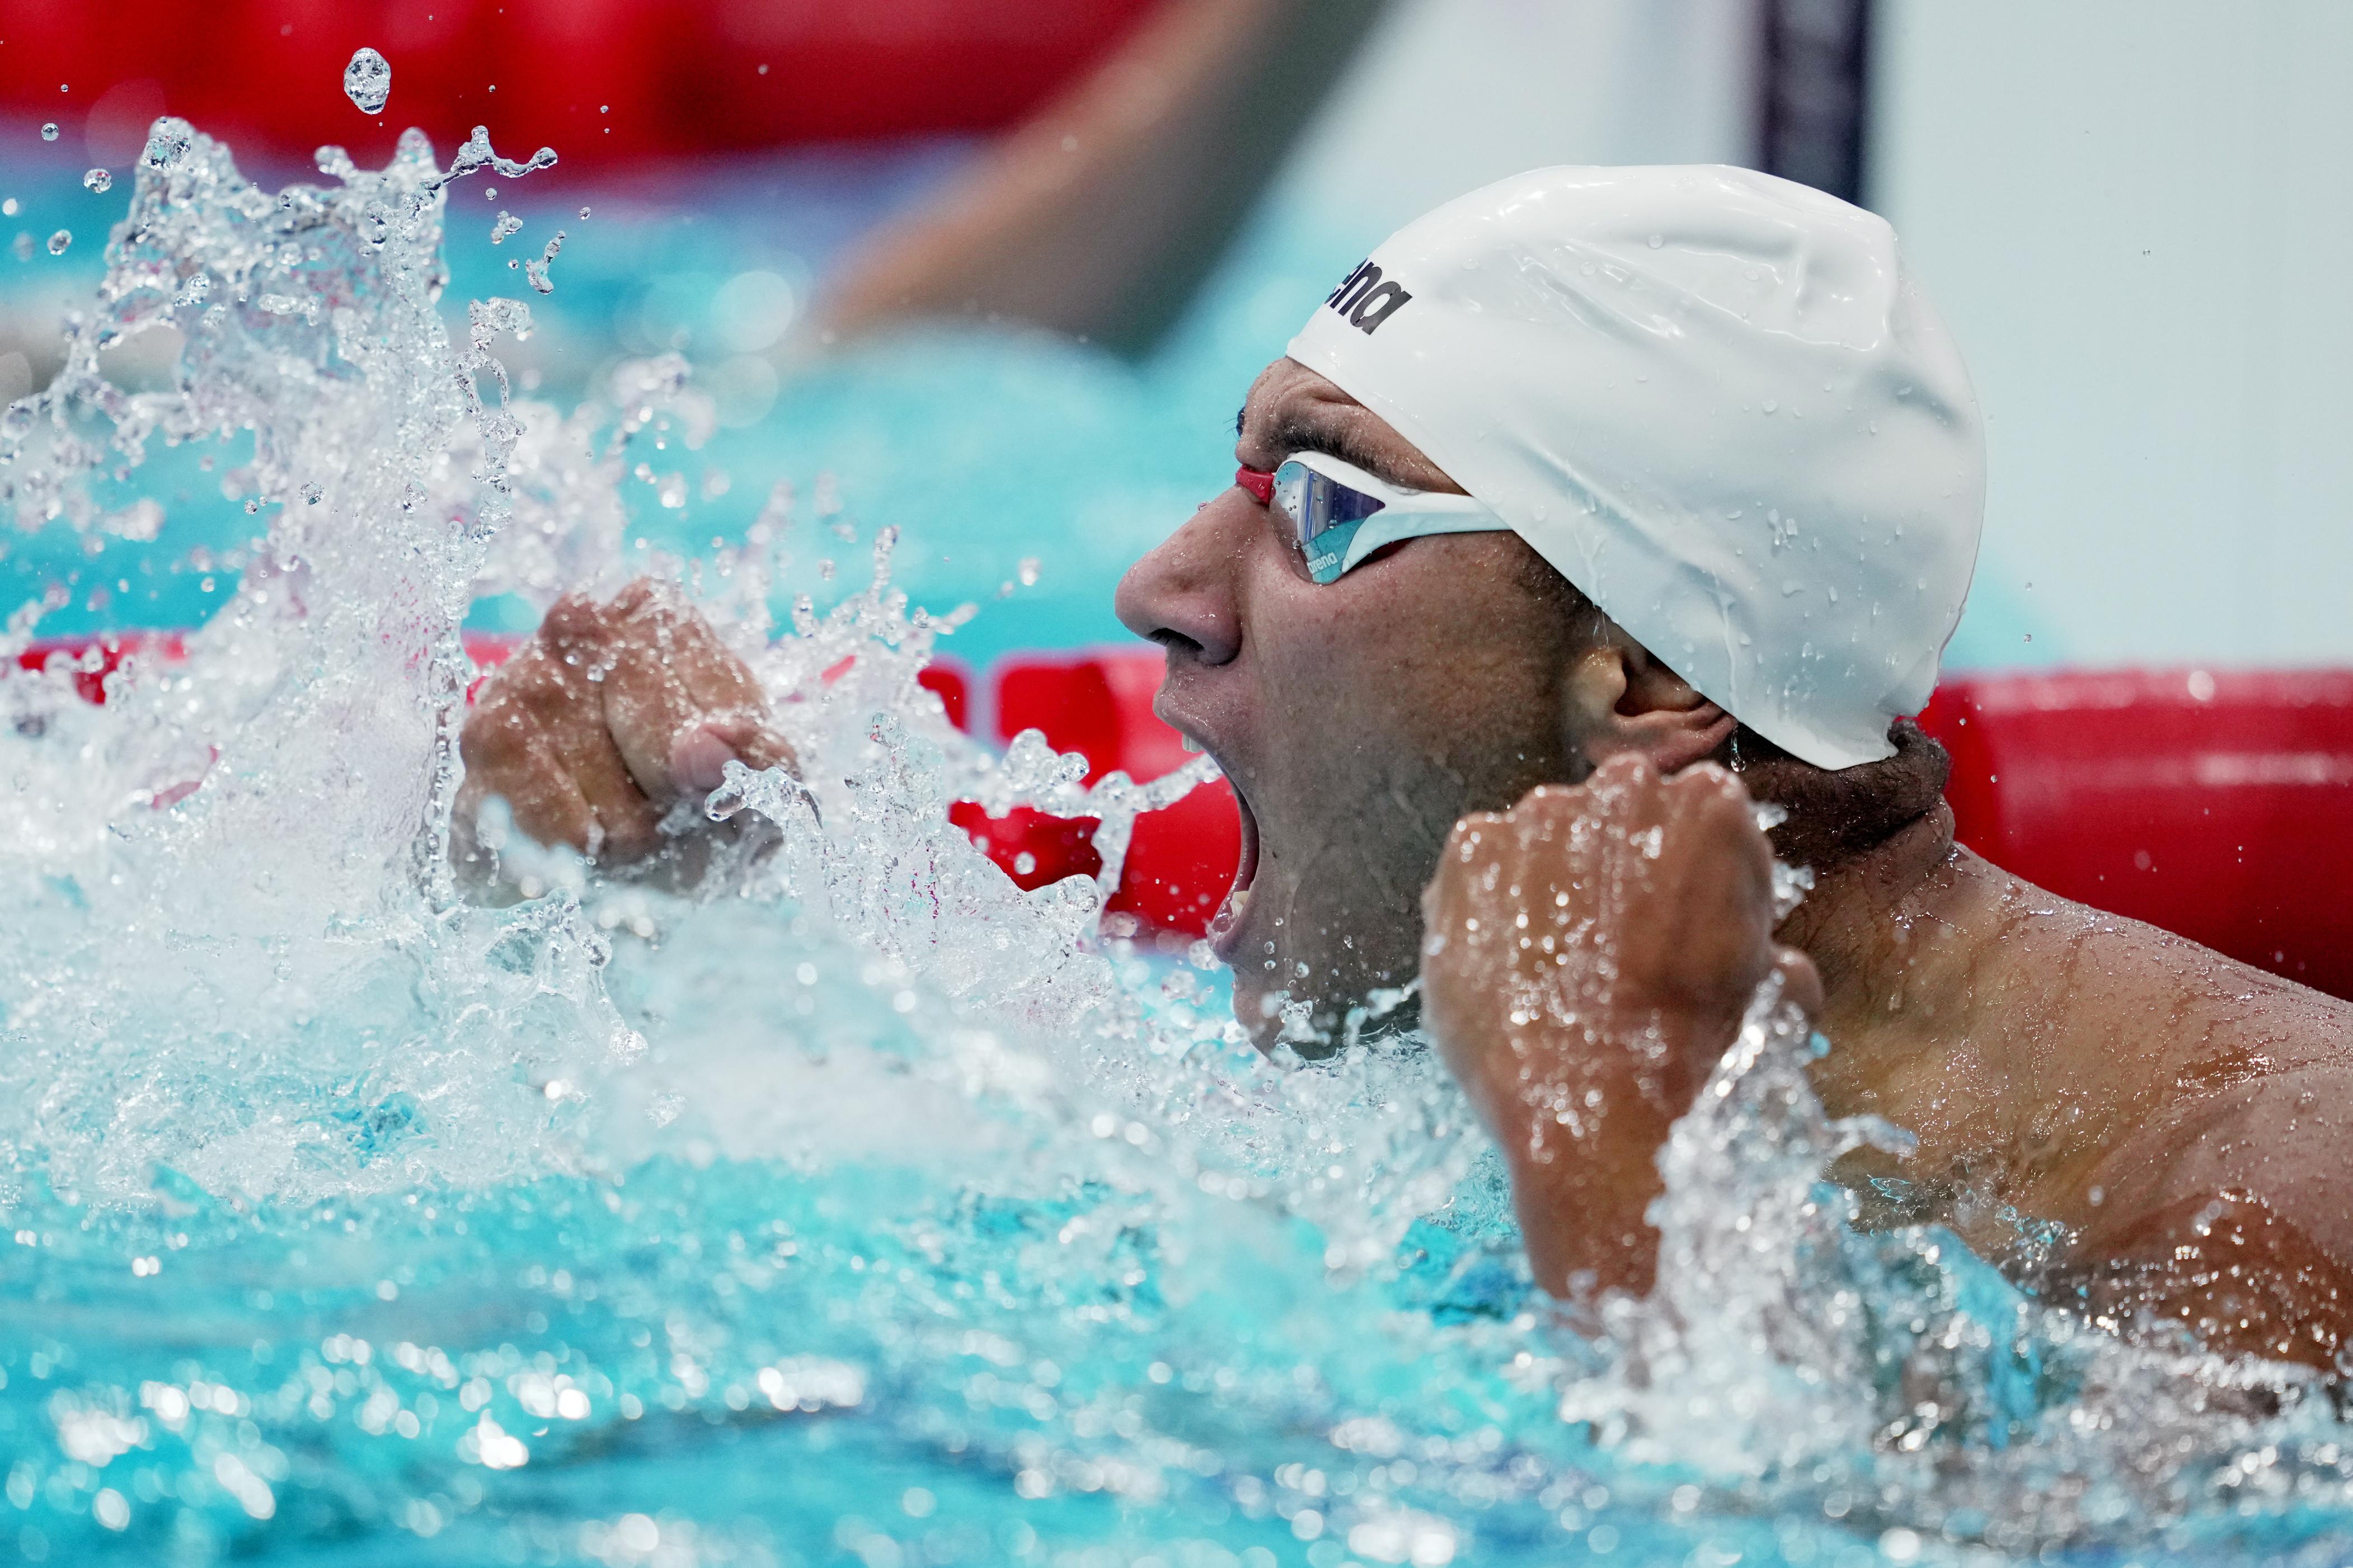 Tokyo 2020 Olympics - Swimming - Men's 400m Freestyle - Final - Tokyo Aquatics Centre - Tokyo, Japan - July 25, 2021. Ahmed Hafnaoui of Tunisia reacts after winning gold. REUTERS/Aleksandra Szmigiel